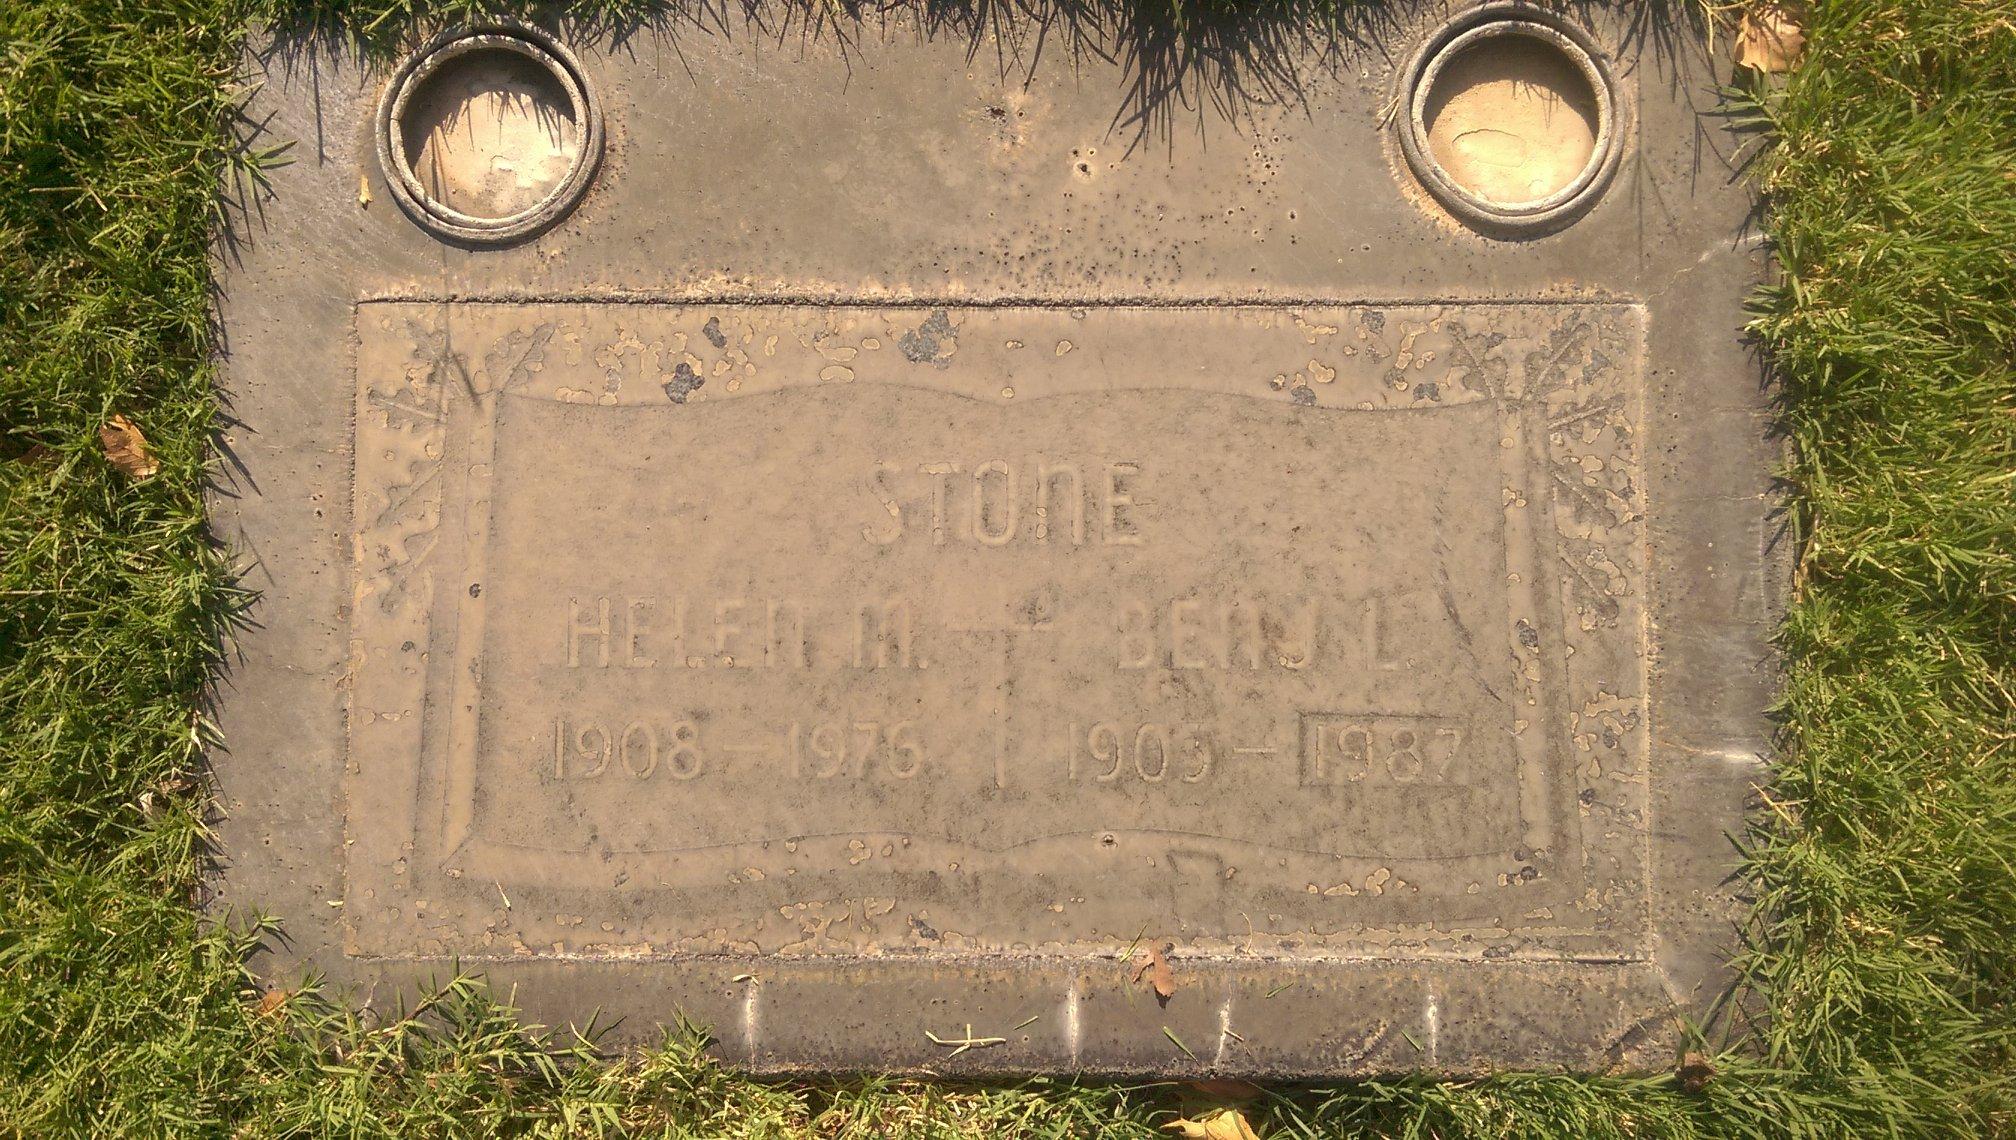 Benjamin Lewis Stone